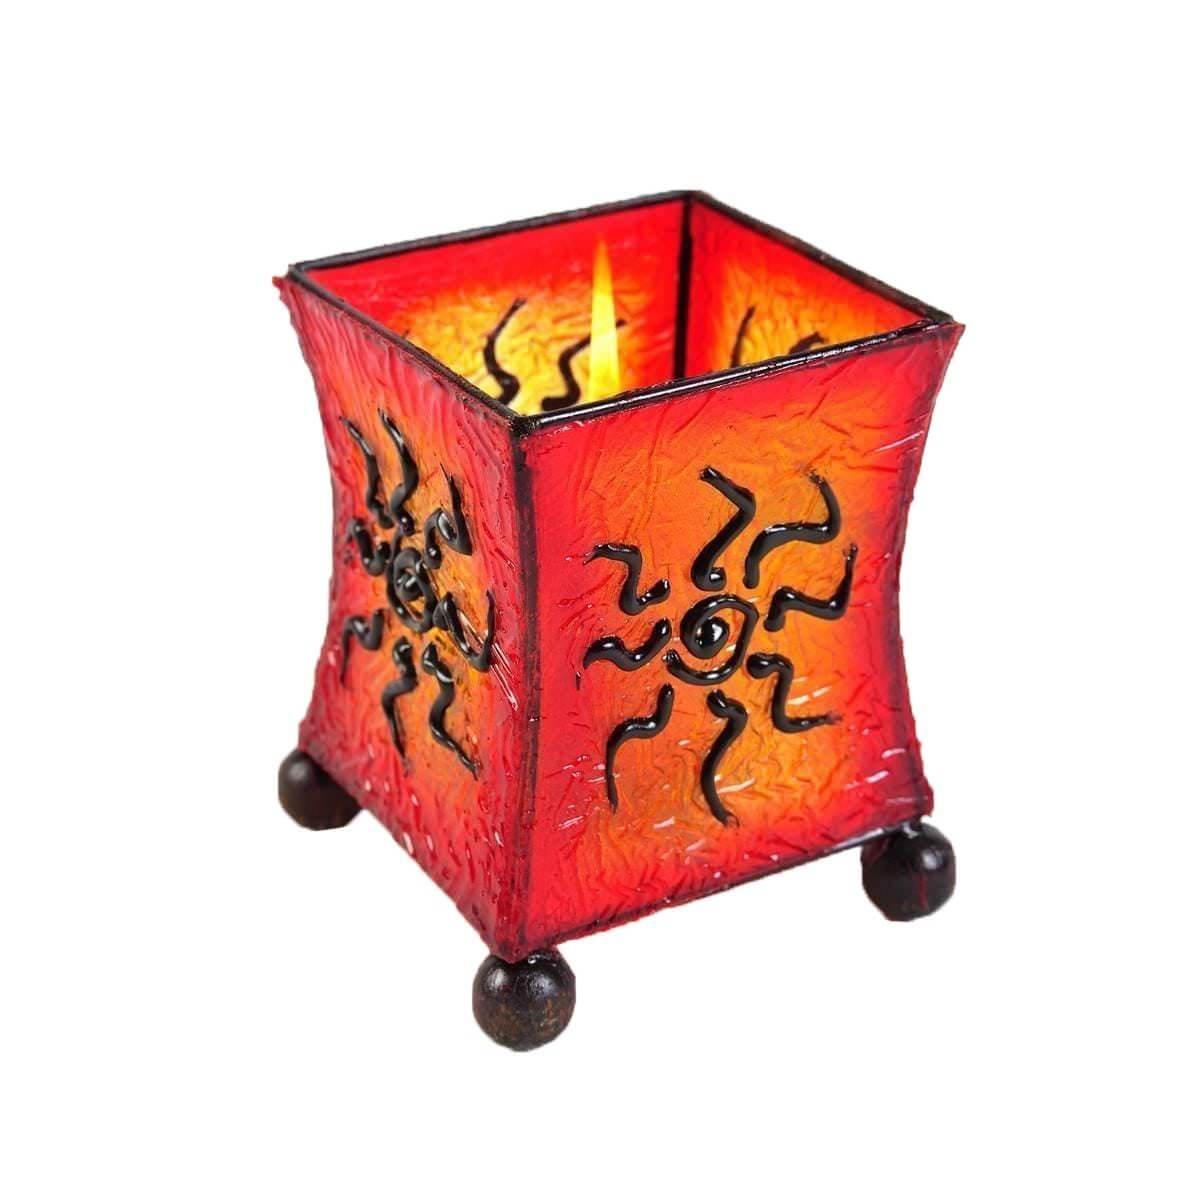 Windlicht teelicht teelichthalter kerzenhalter deko resin for Teelicht deko